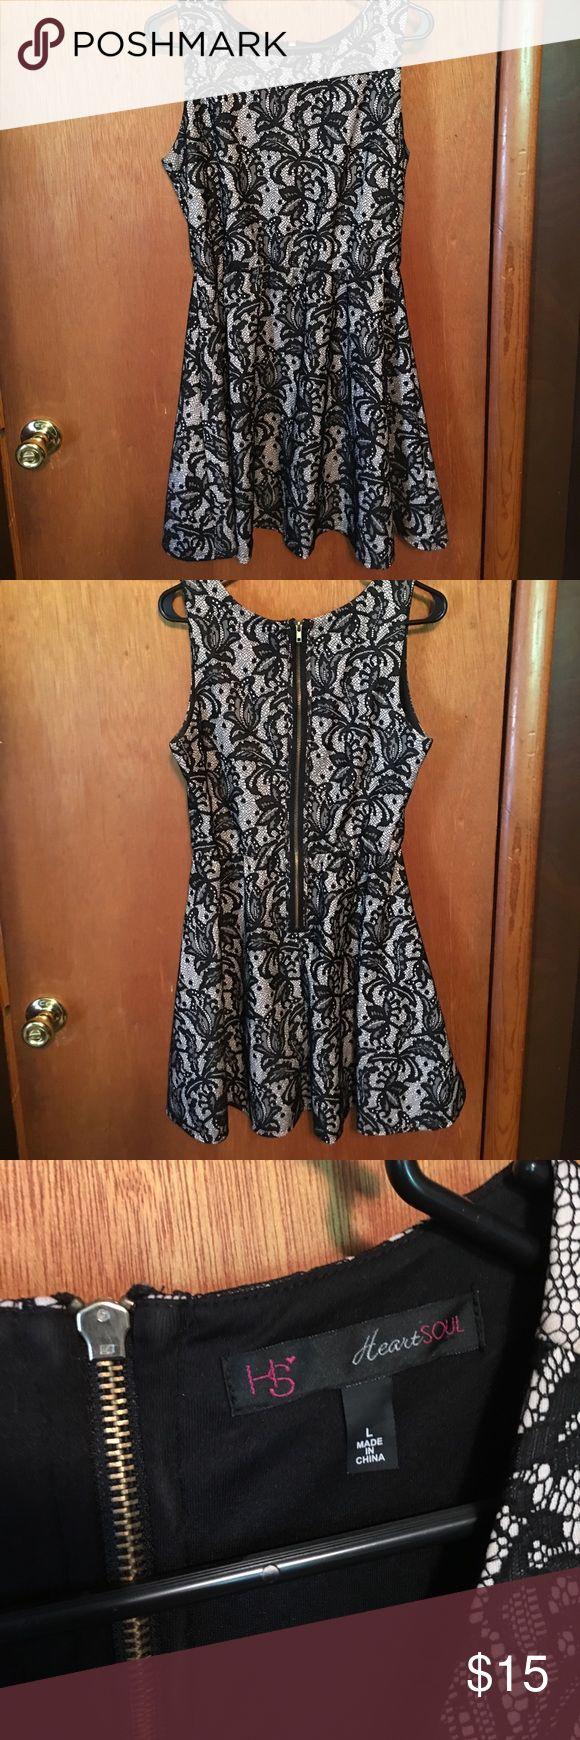 Beautiful Black and Tan lace dress Beautiful Black and Tan lace dress. Mid length. Zipper back.size L HeartSoul Dresses Midi